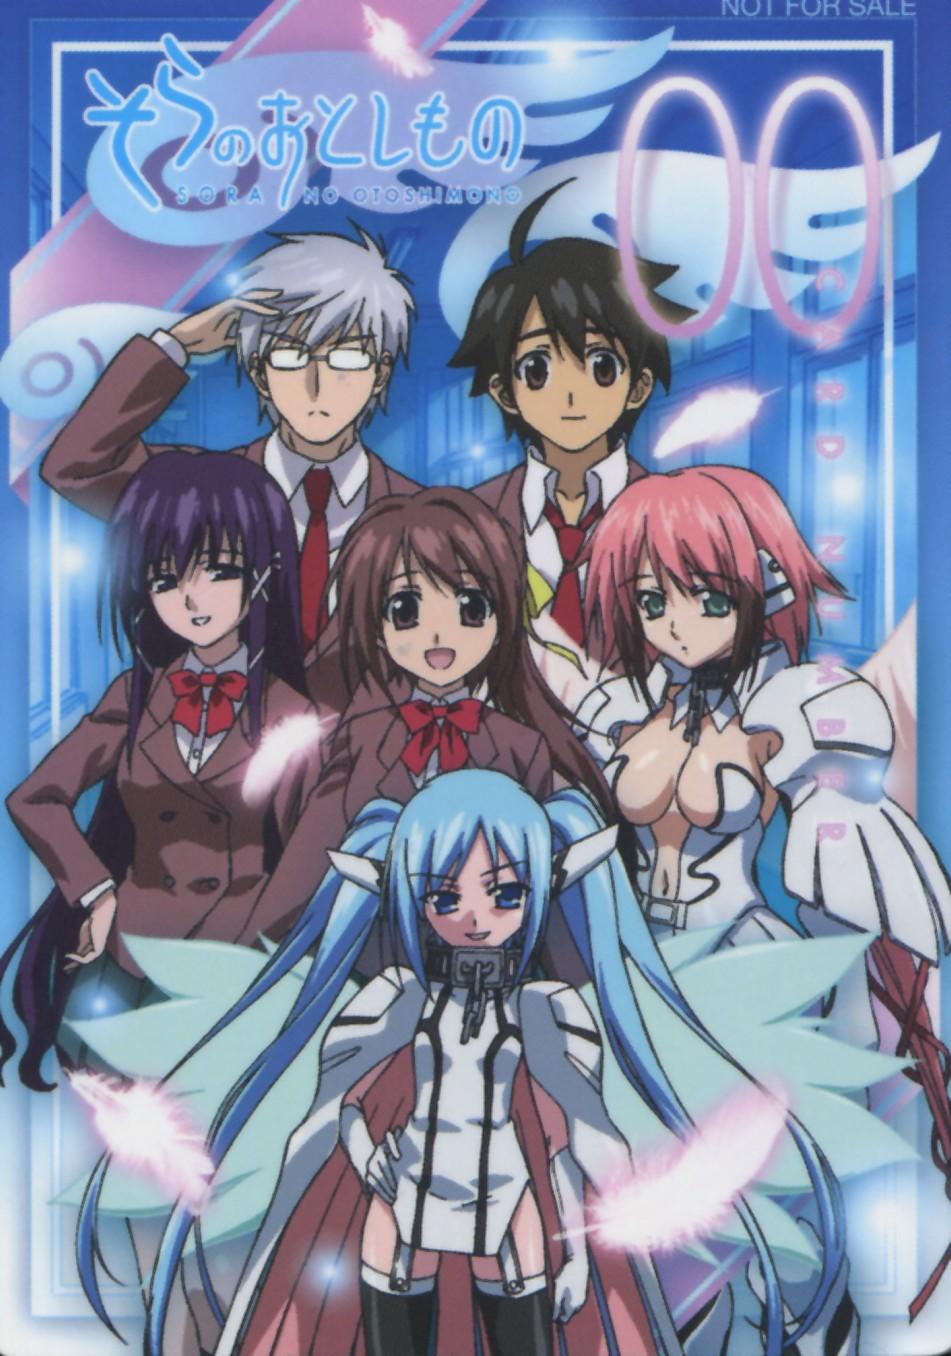 Sora no Otoshimono Primera Temporada |13/13| |Subtitulado| |Mega|